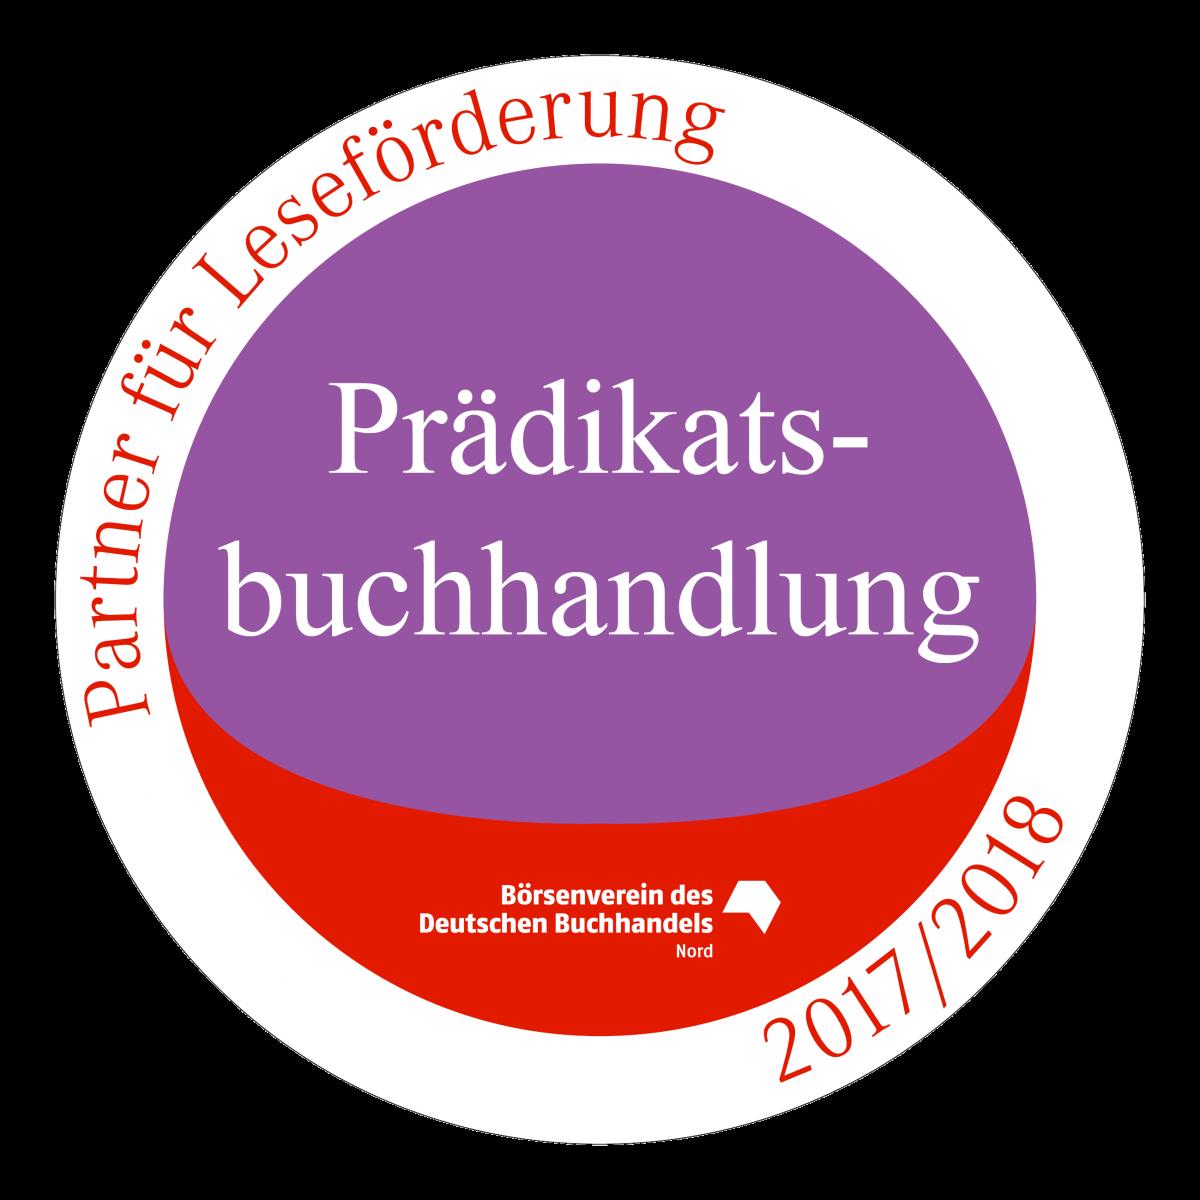 praedikatsbuchhandlung_2017-2018_0.png